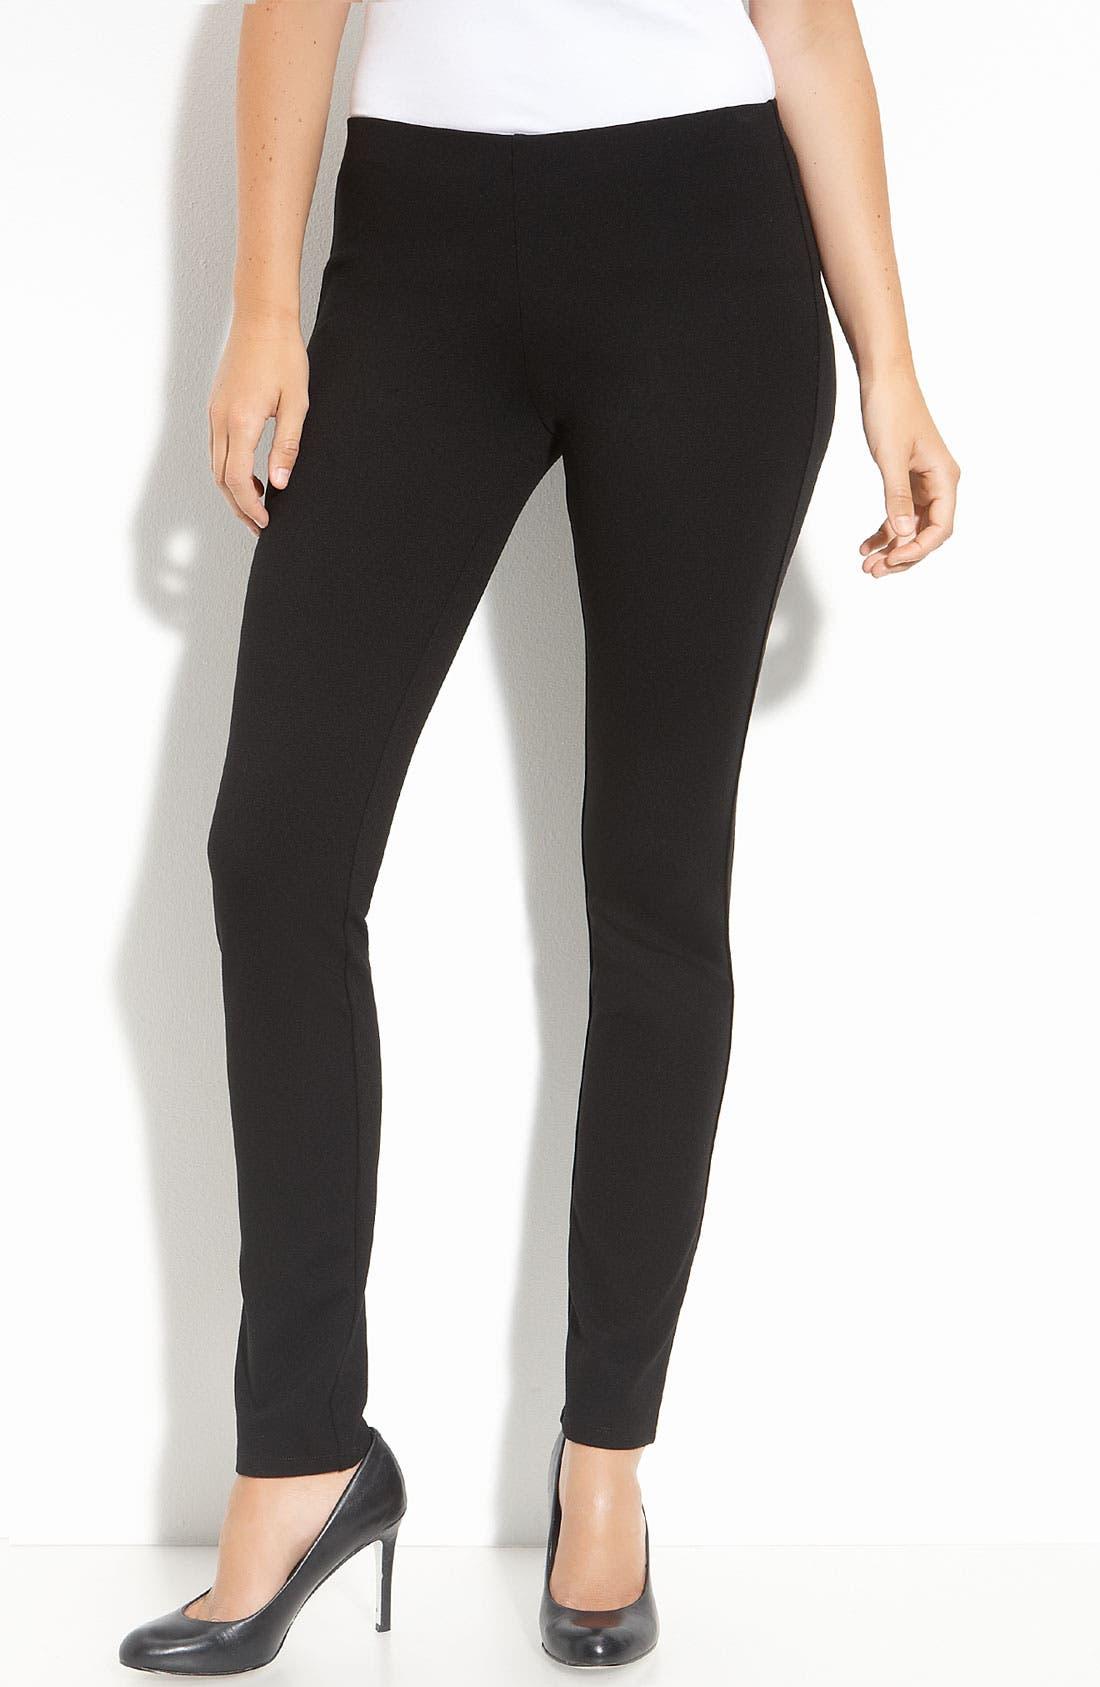 Alternate Image 1 Selected - Eileen Fisher Slim Ponte Knit Pants (Regular & Petite)